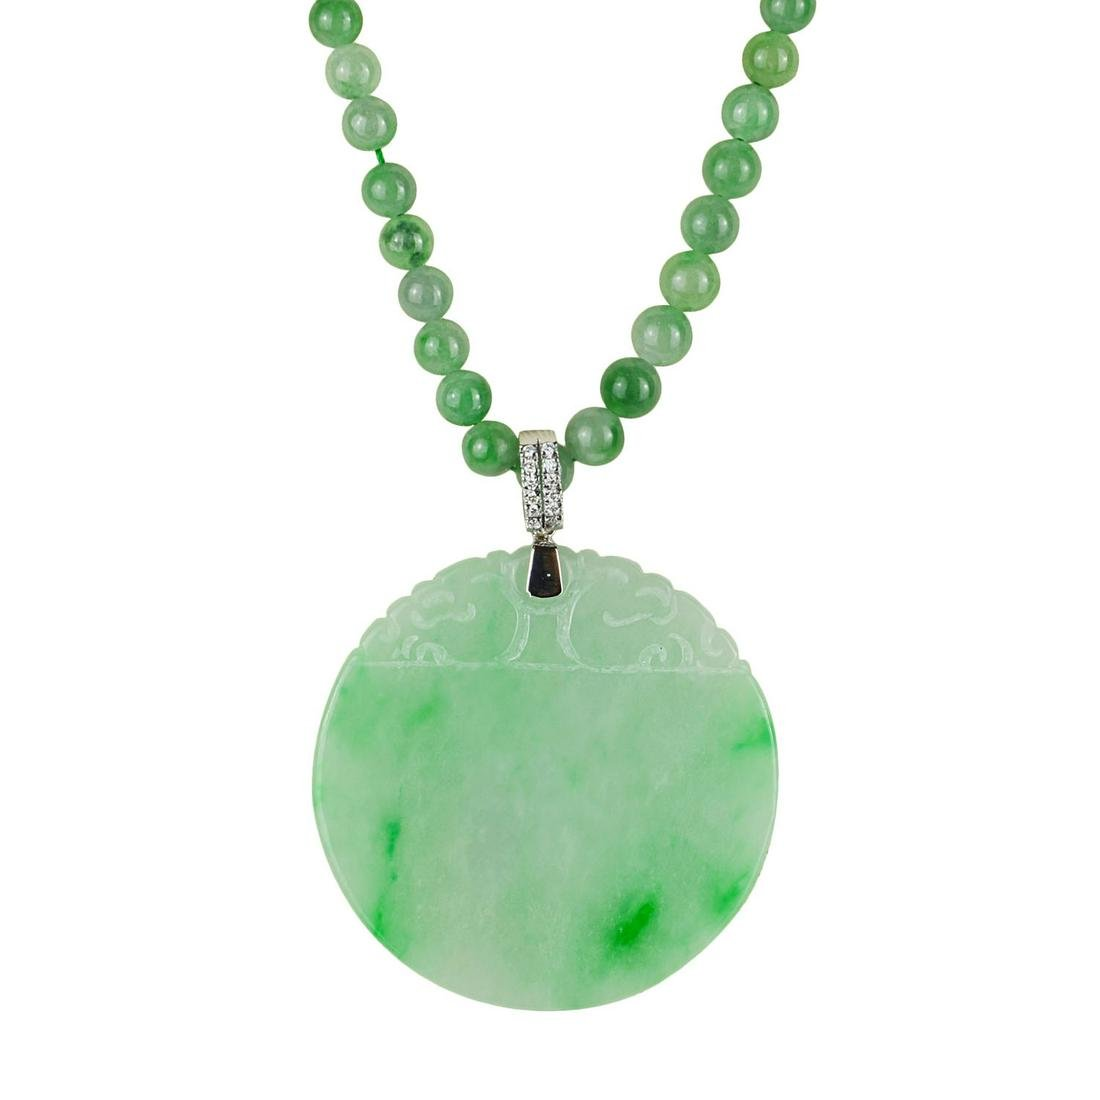 An Apple Green Jadeite Round Pendant with Diamond Clasp